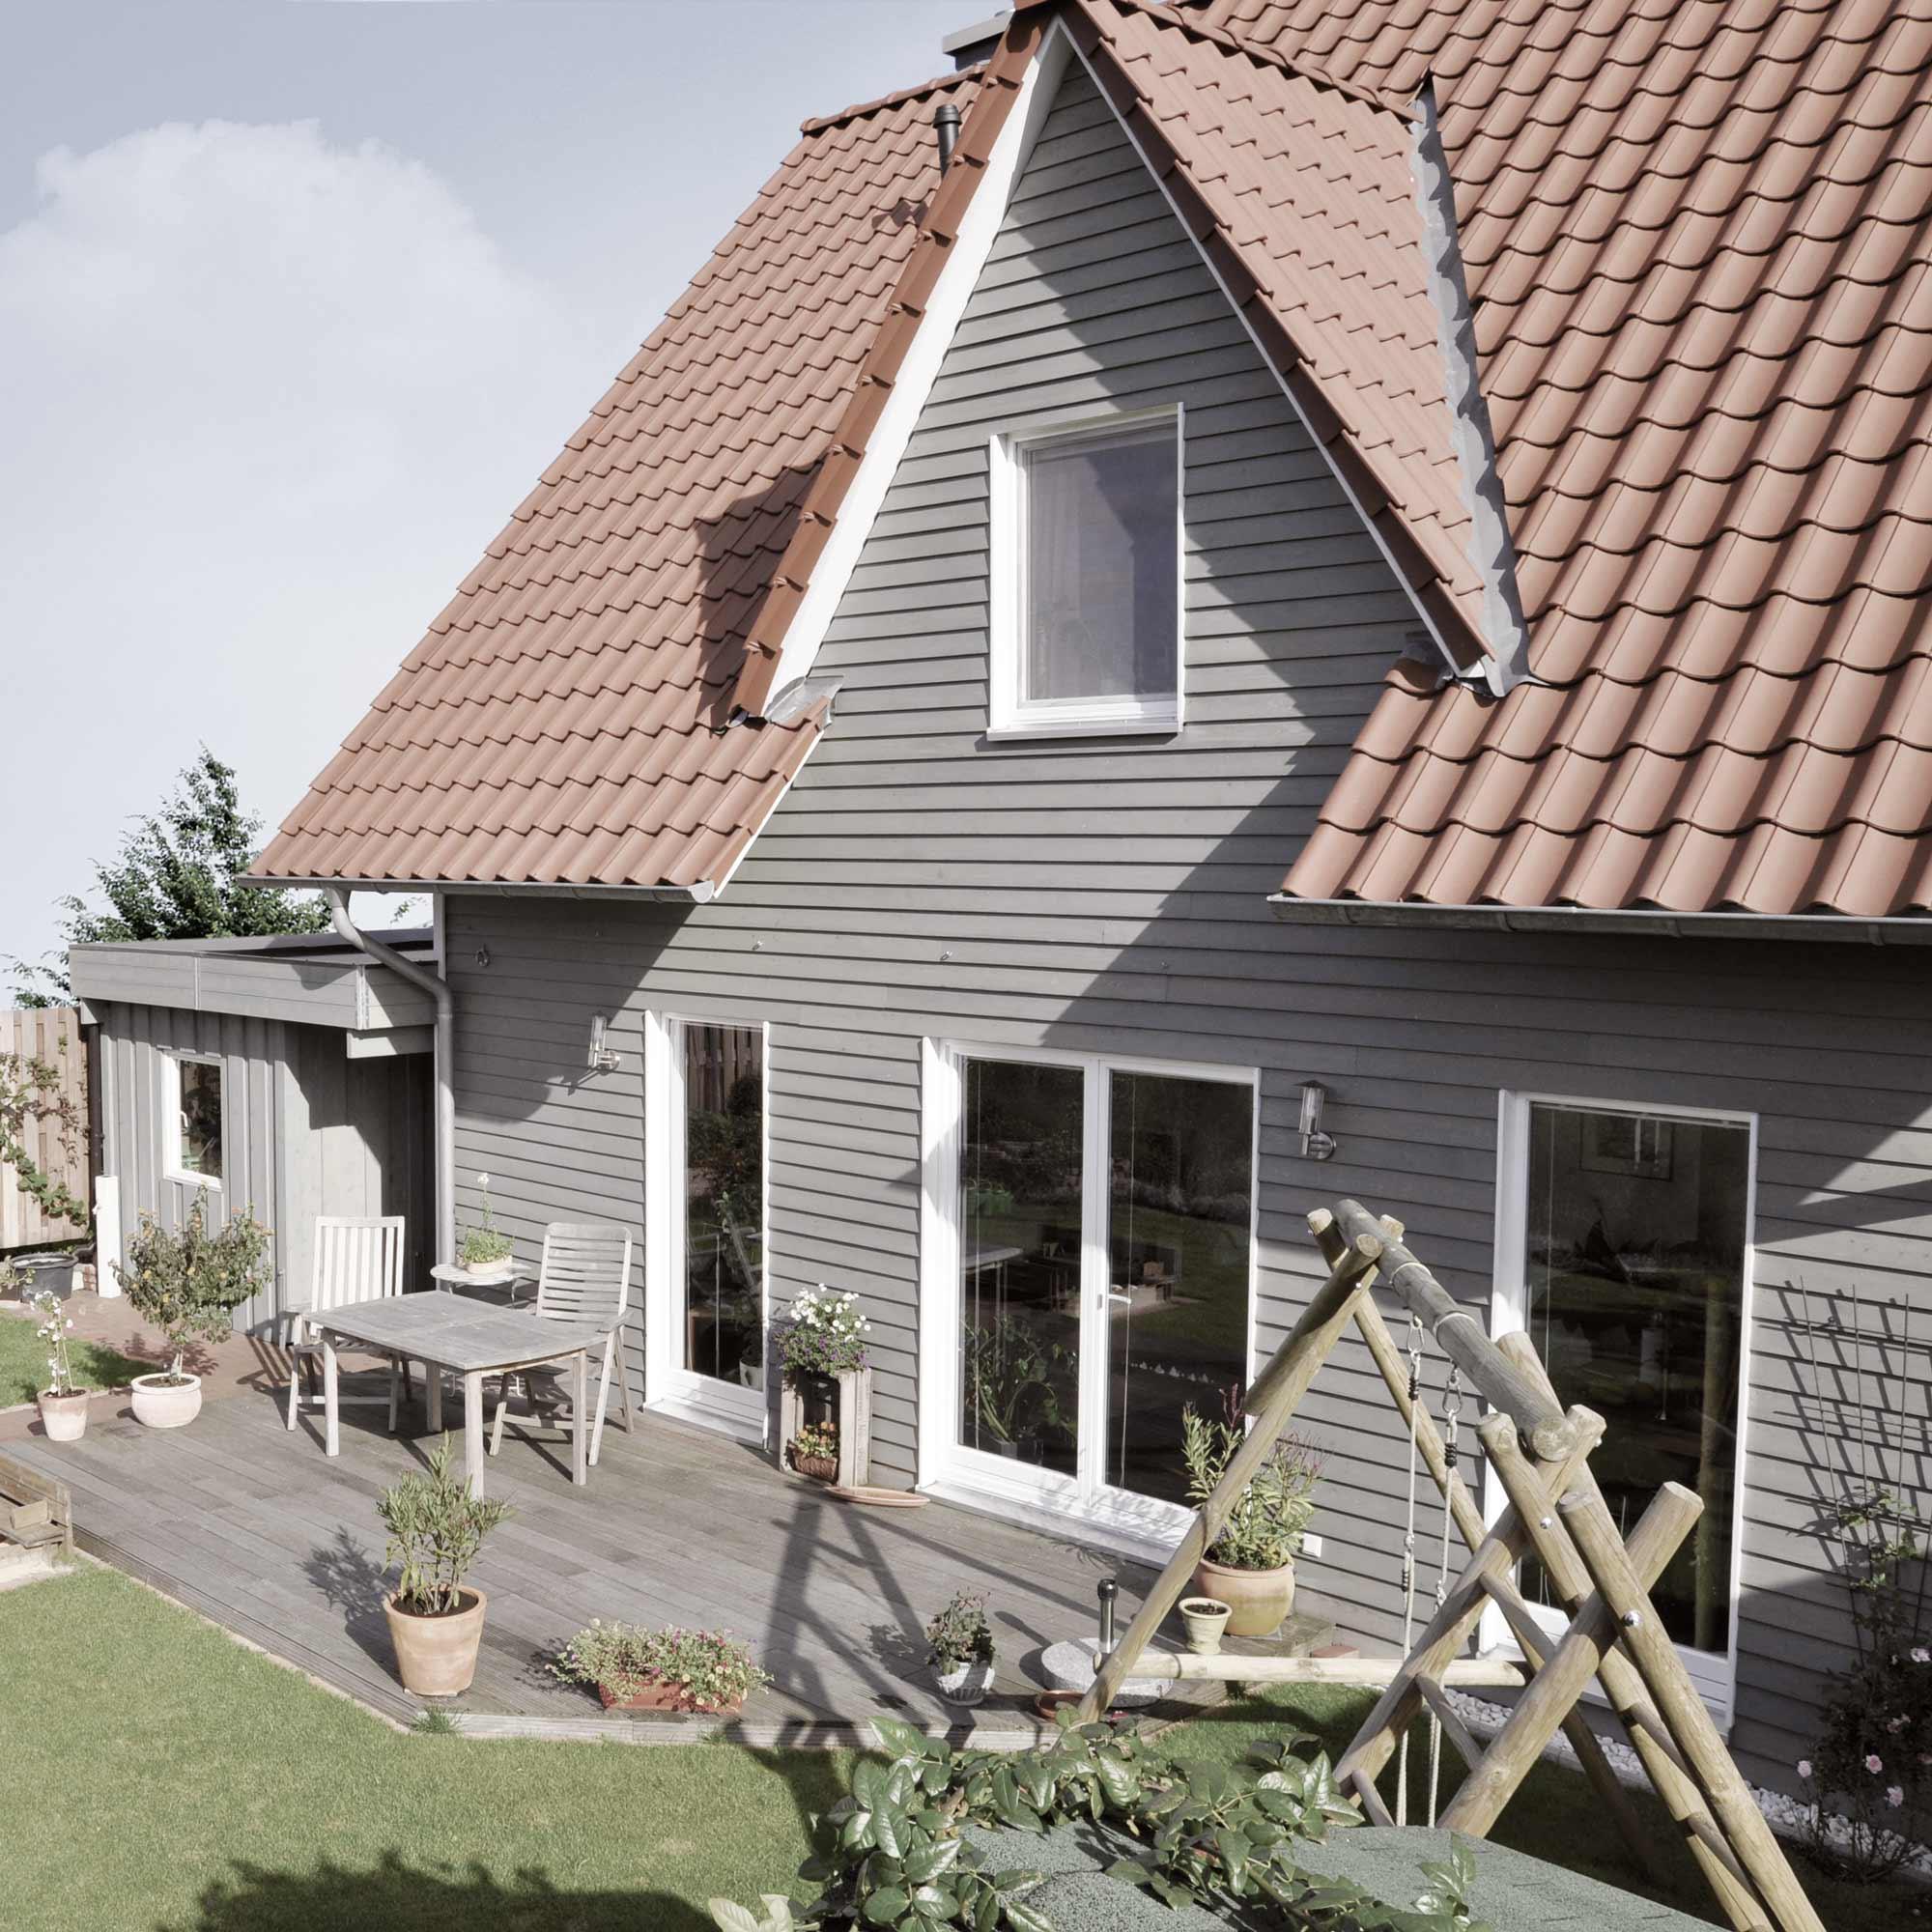 Holzfassade aus Hobelware hellgrau – HolzLand Verbeek